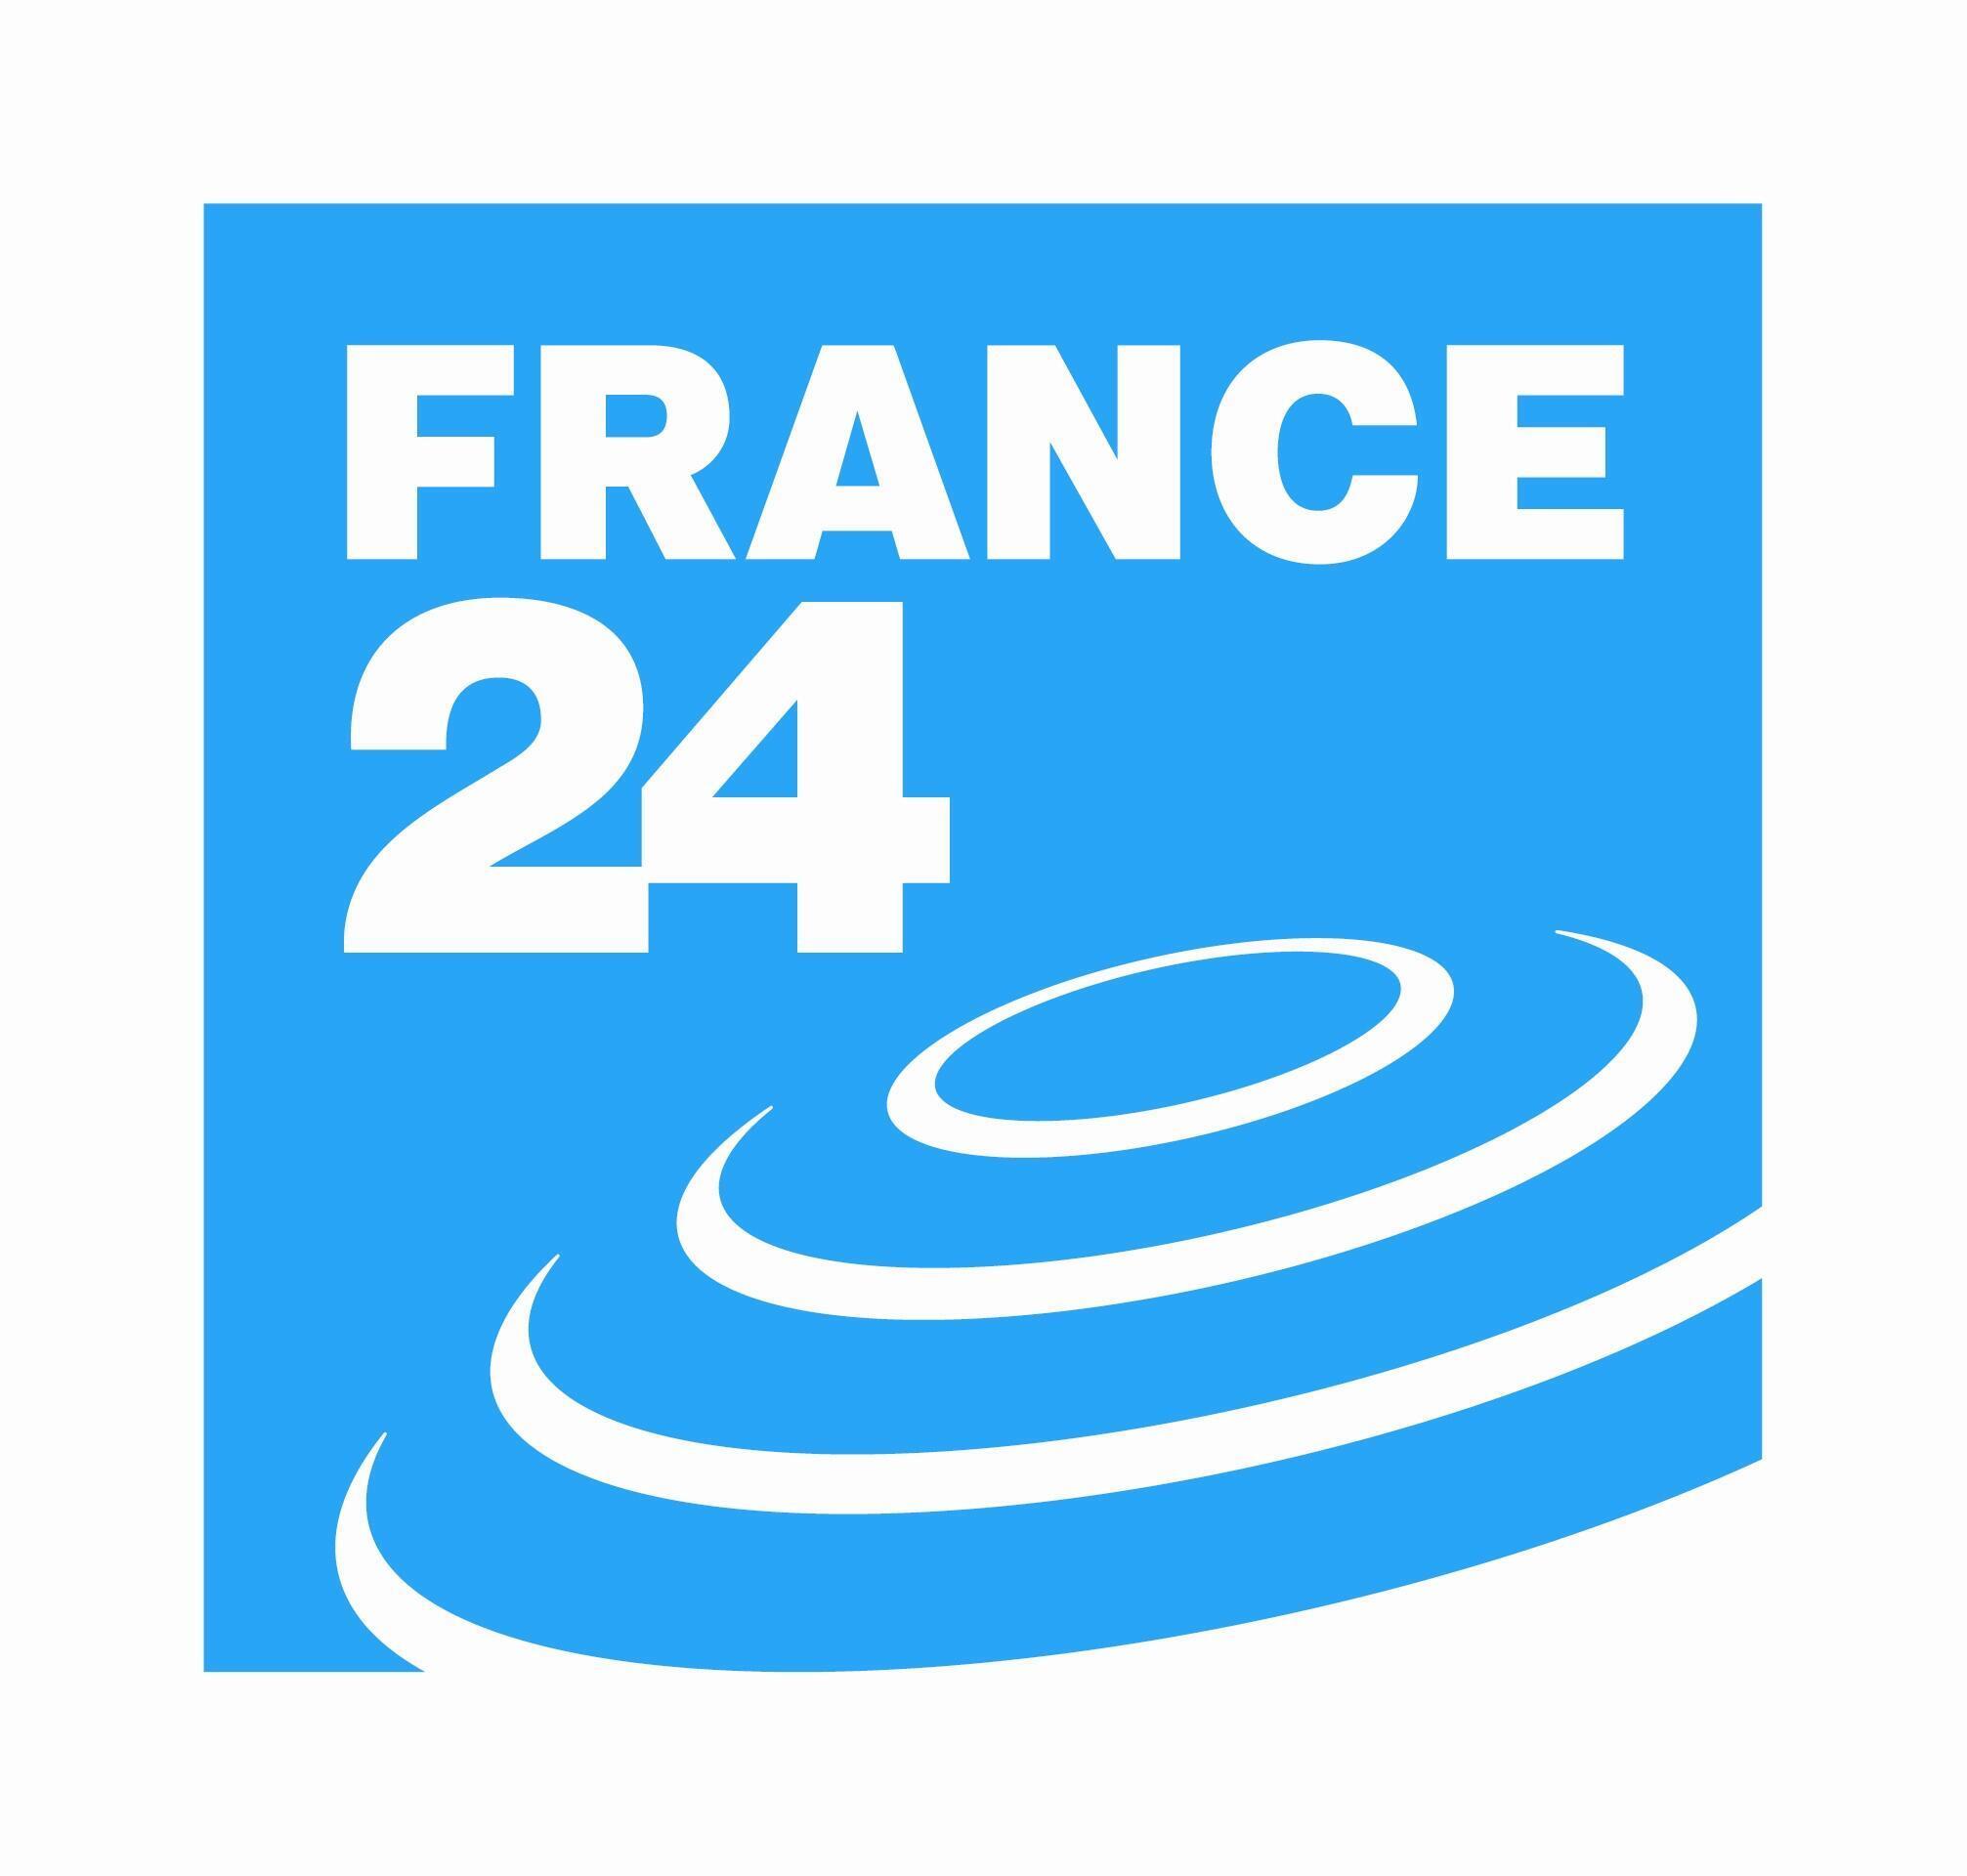 Le logo de France 24.